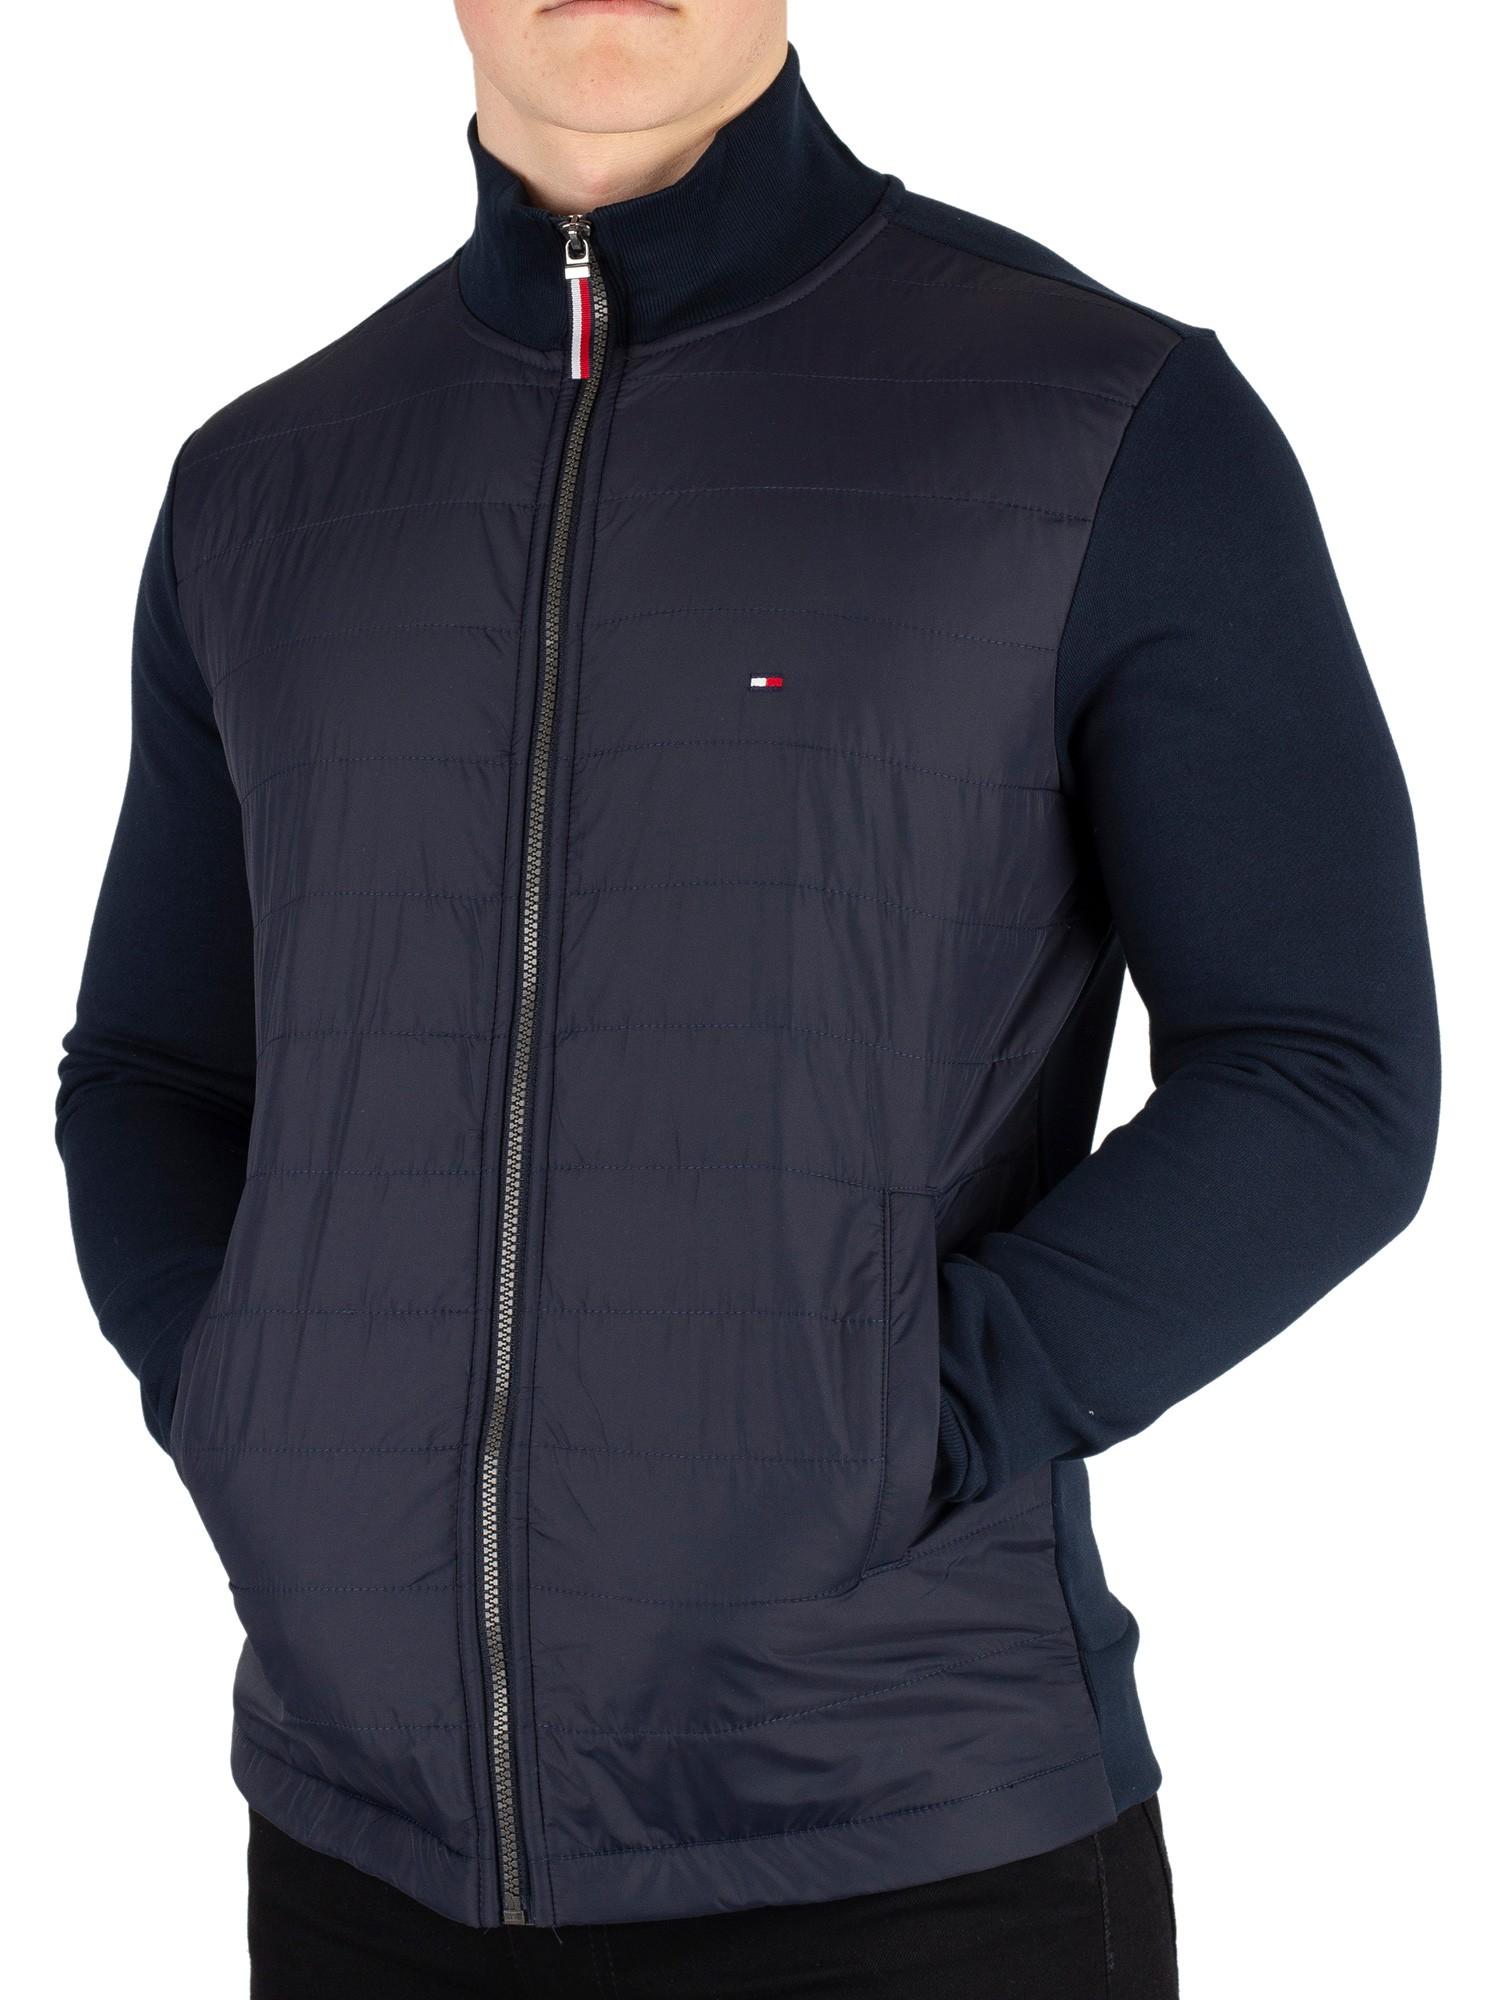 a0f11c3db412d7 Tommy Hilfiger Sky Captain Mixed Media Zip Jacket | Standout